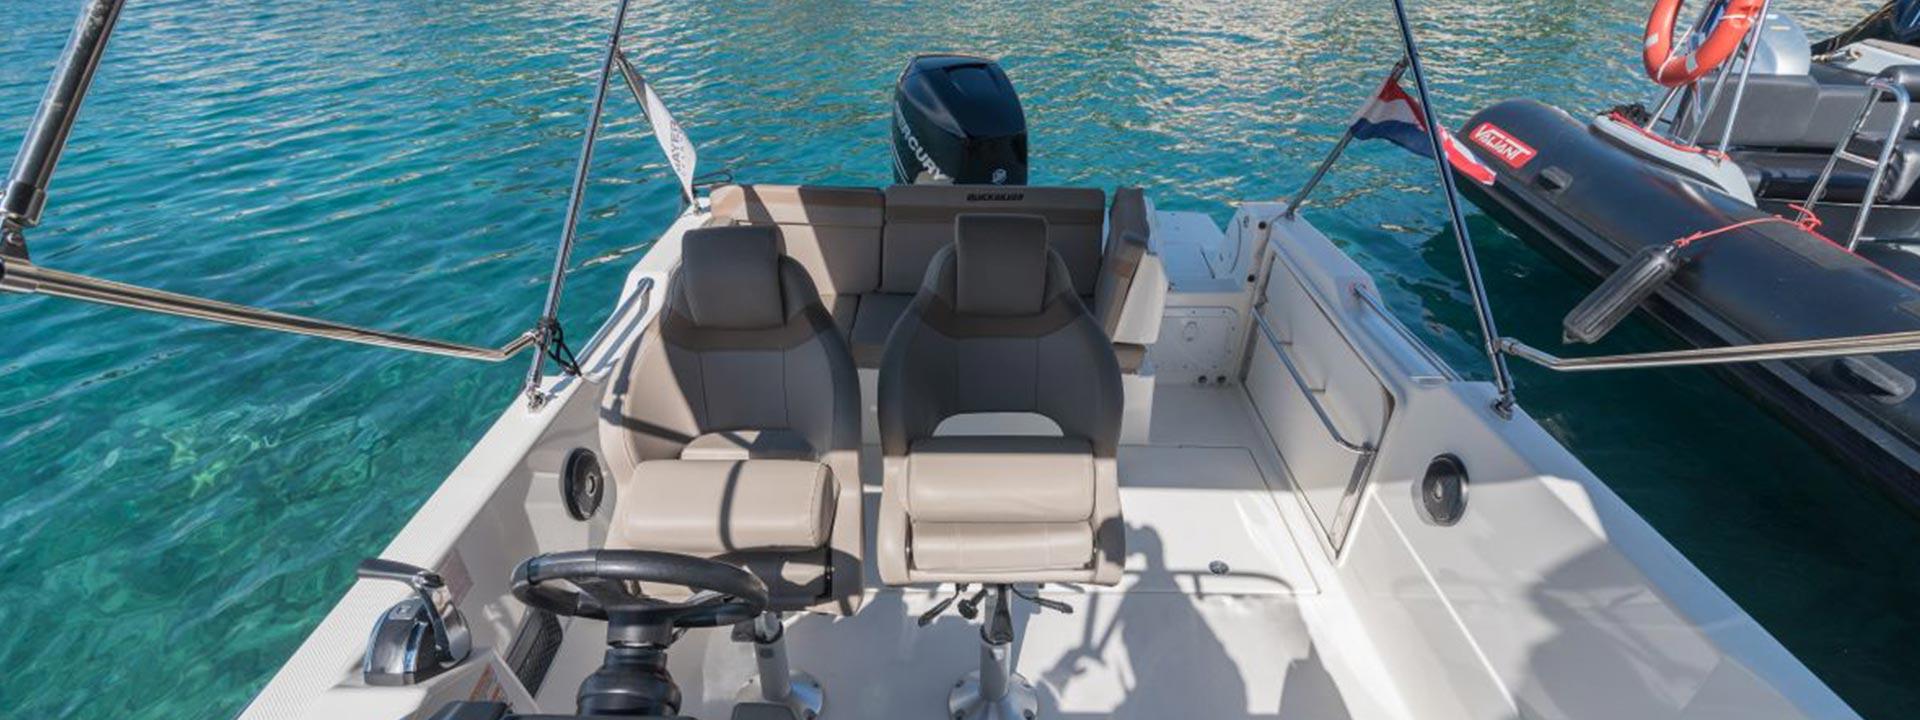 mayer-charter-boat-header-quicksilver-activ-755-sundeck-04